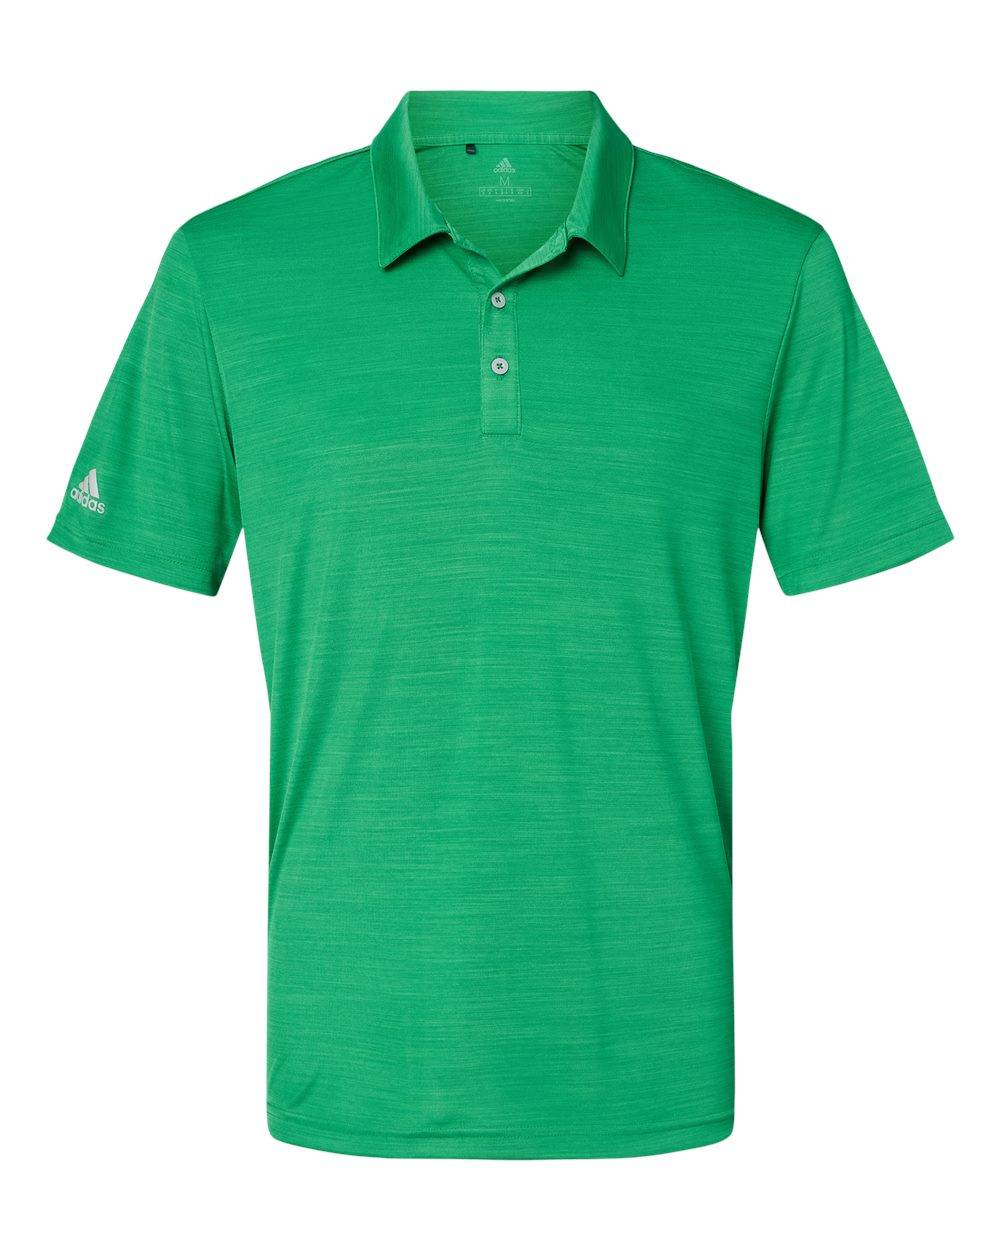 Adidas - Mlange Sport Shirt - A402 - Team Green Melange - Small